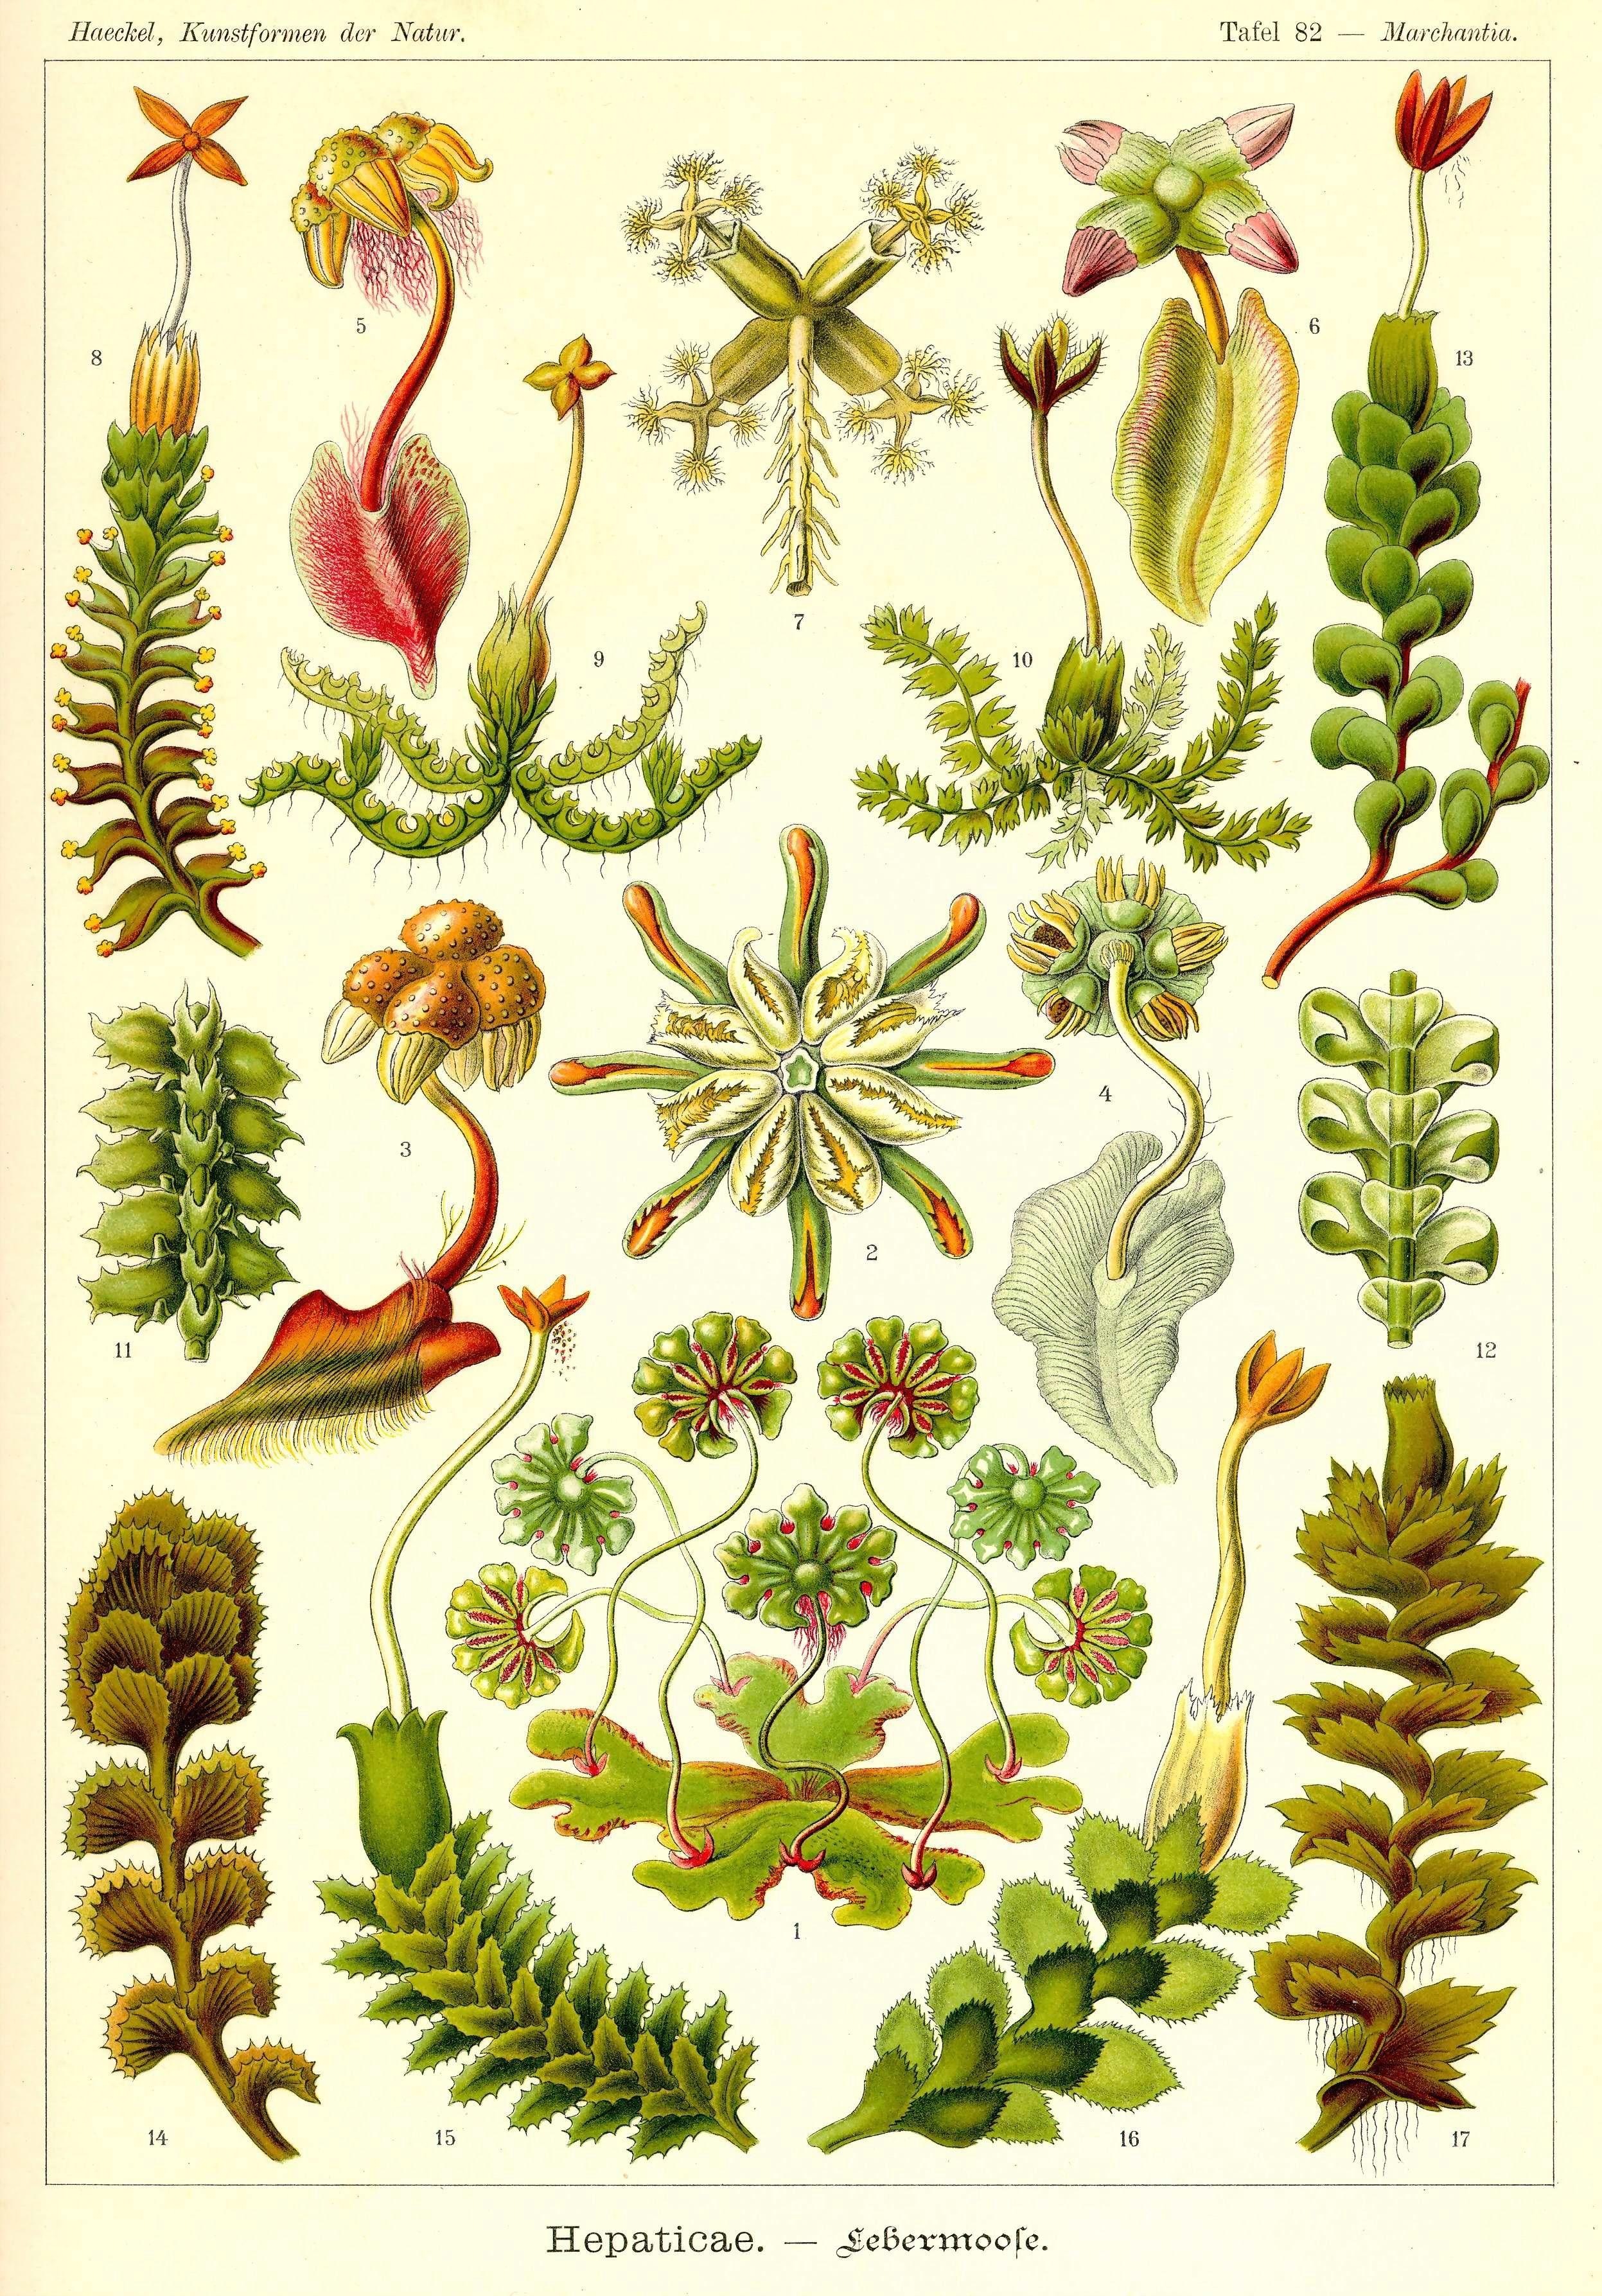 Kunstformen der Natur Tafel 82 - Marchantia